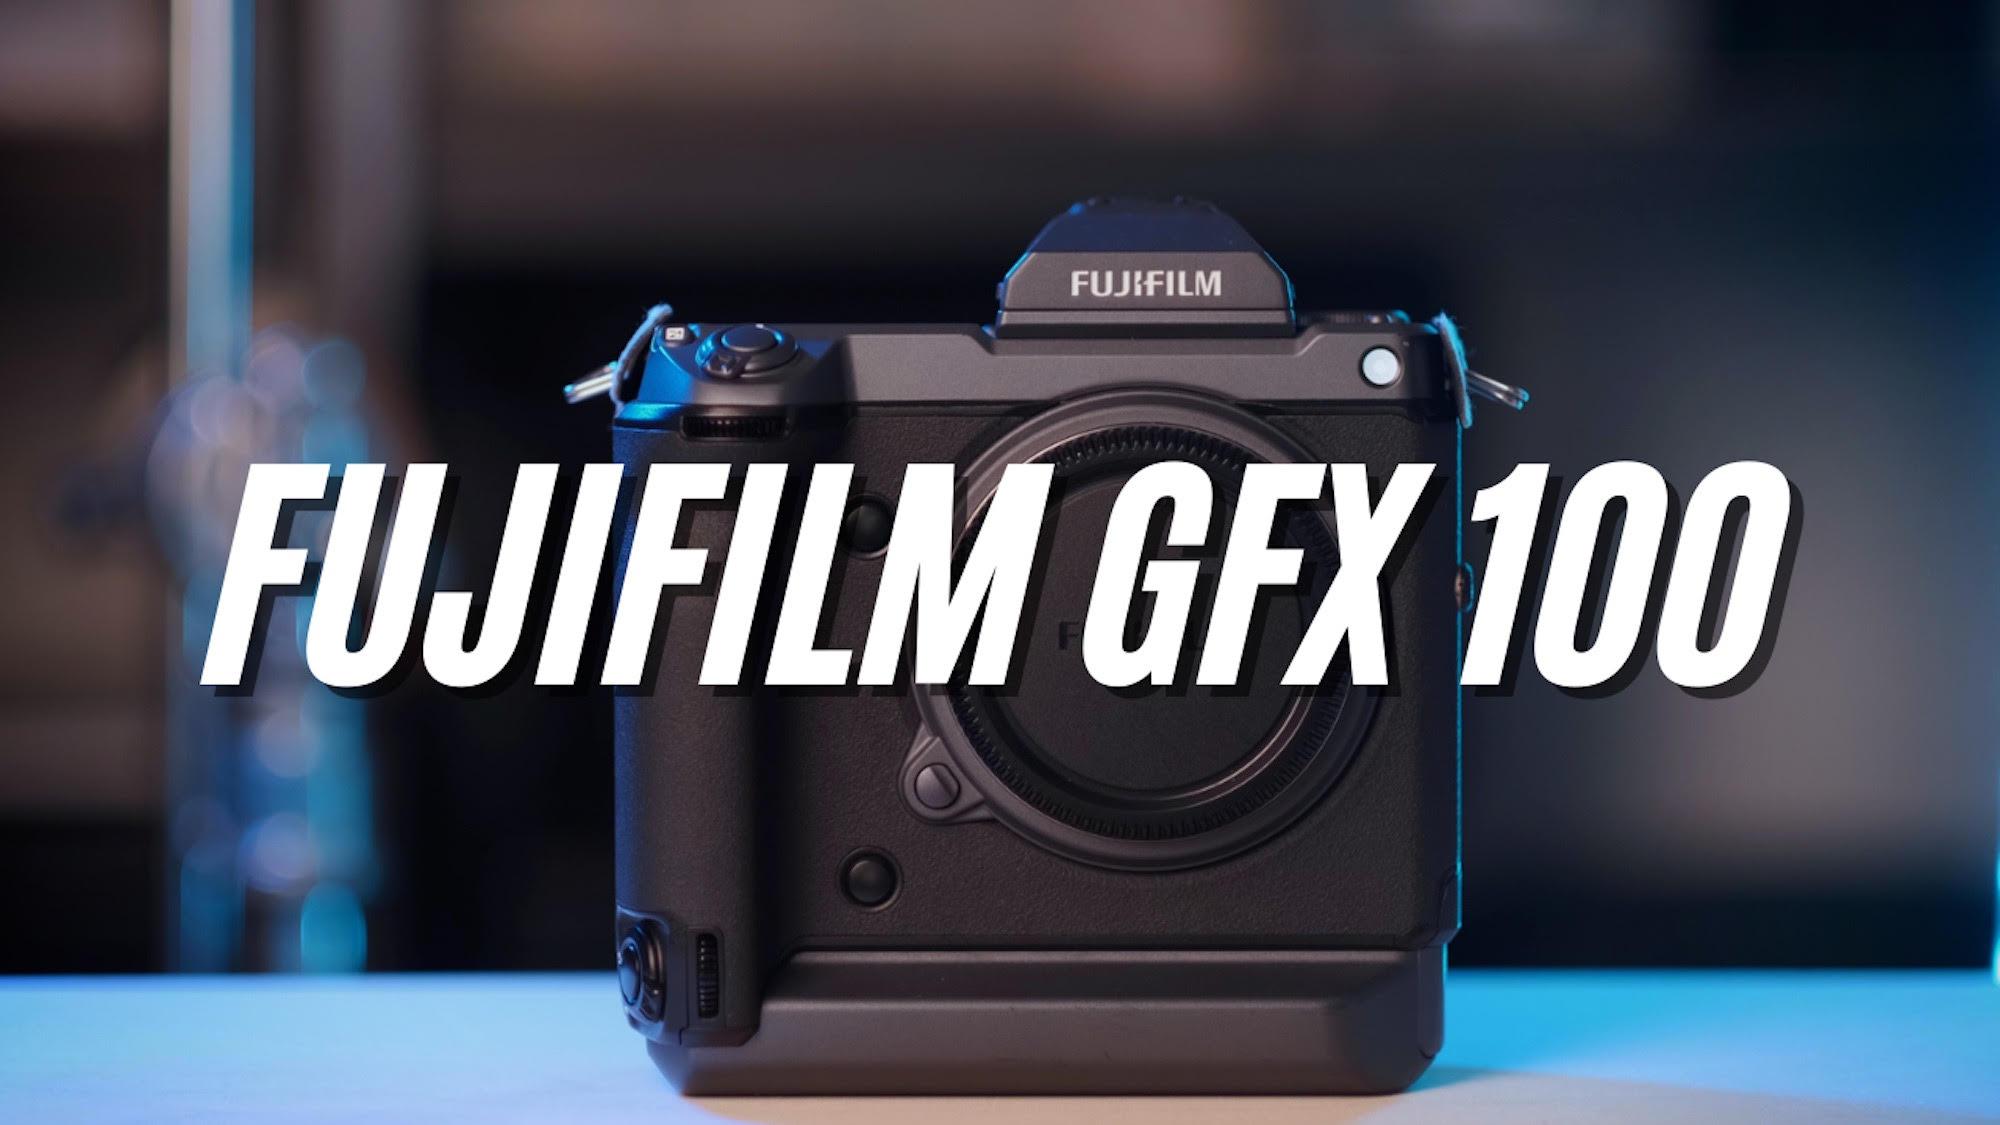 FUJIFILM GFX 100 – Review (Video)